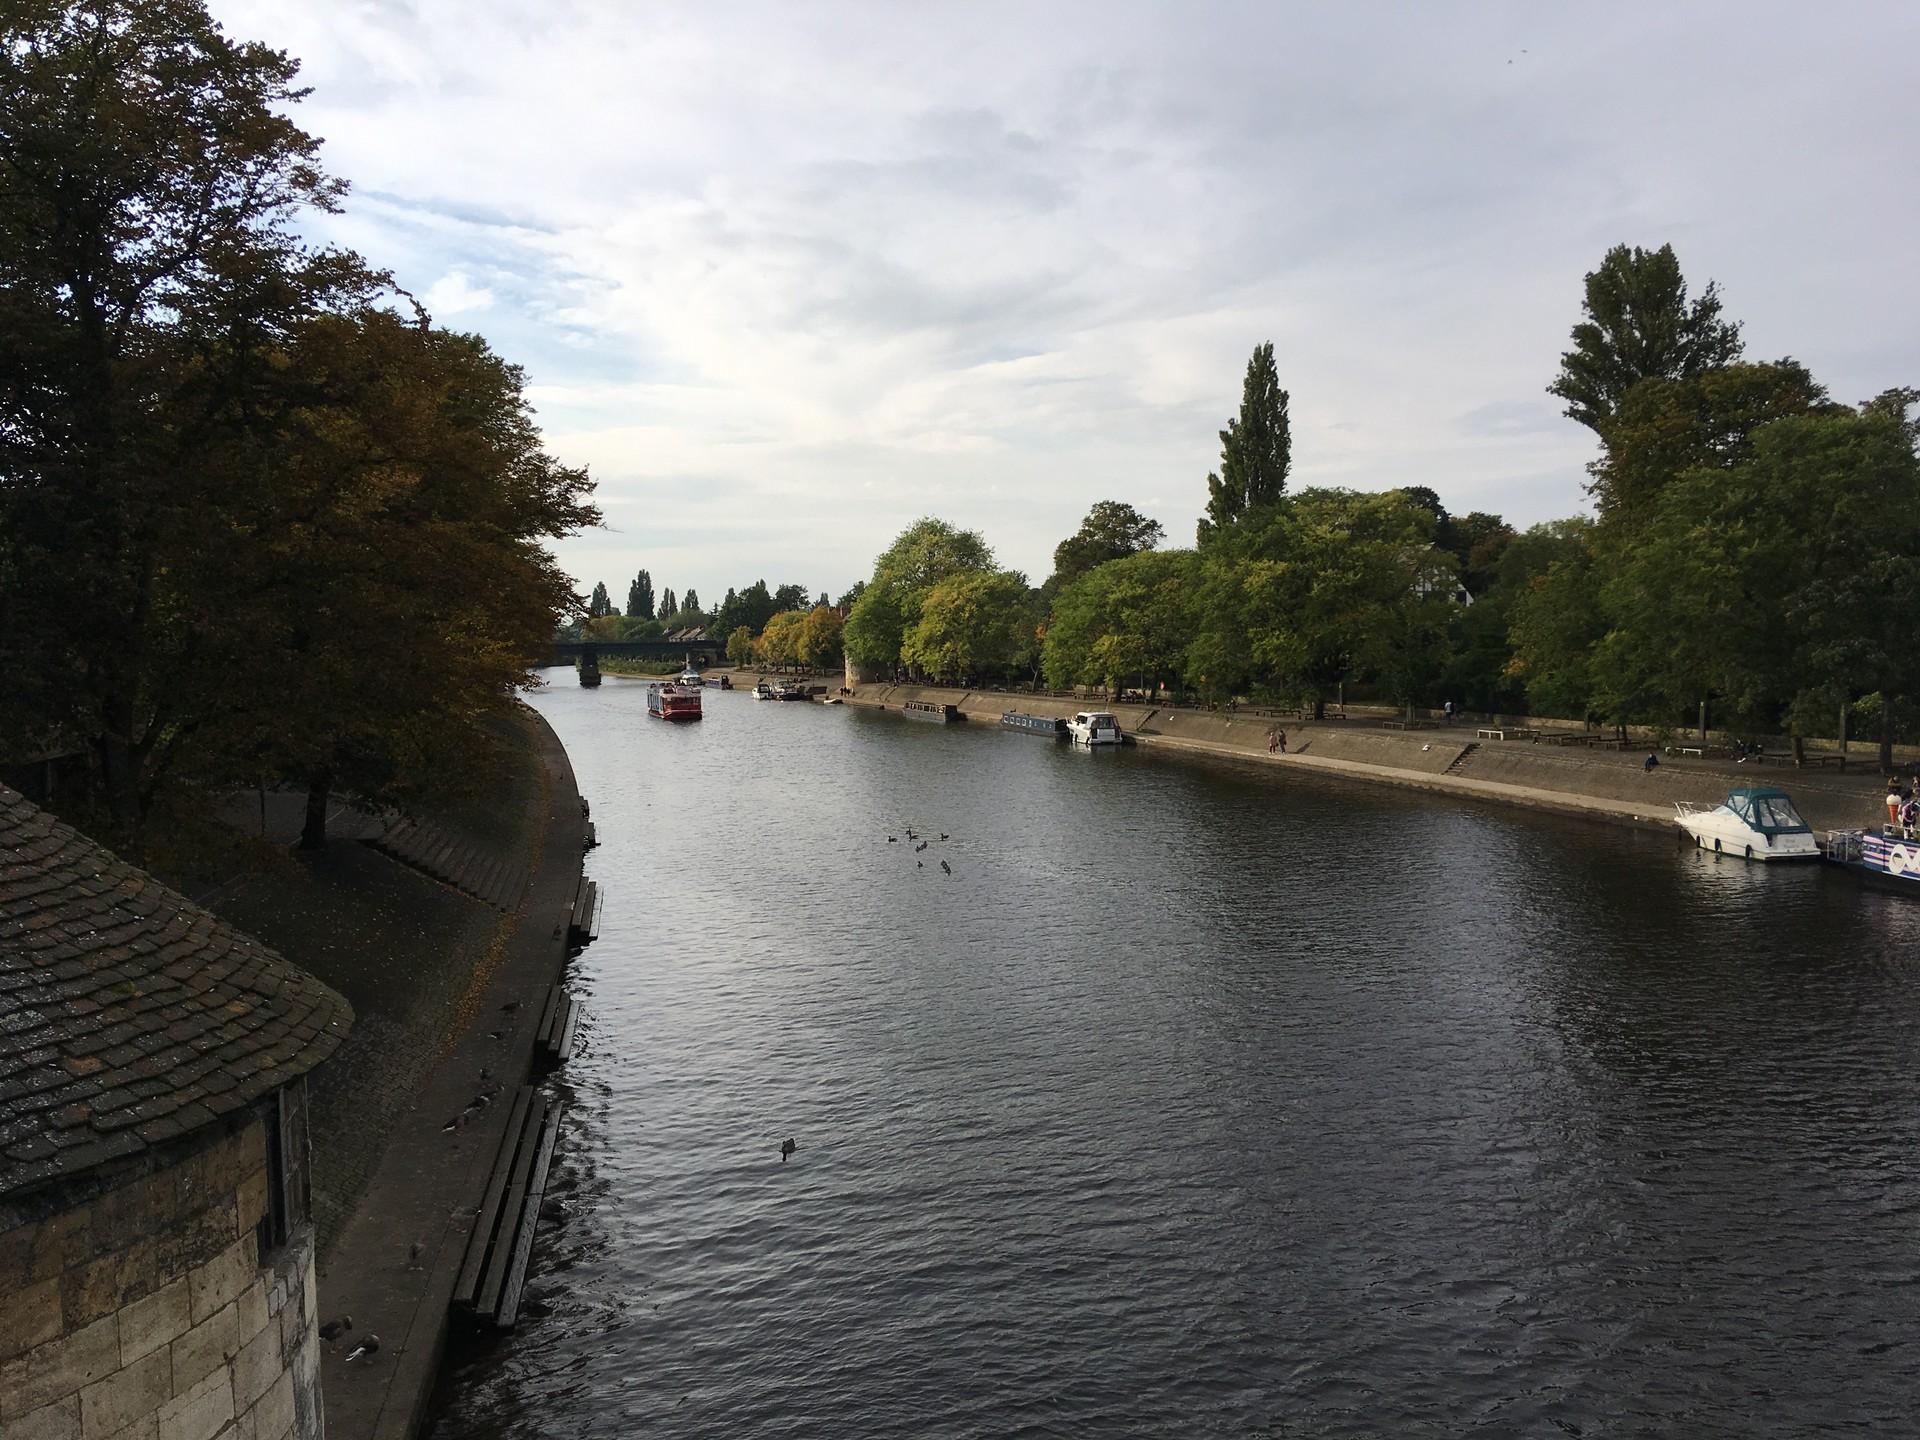 erasmus-experience-in-kingston-upon-hull